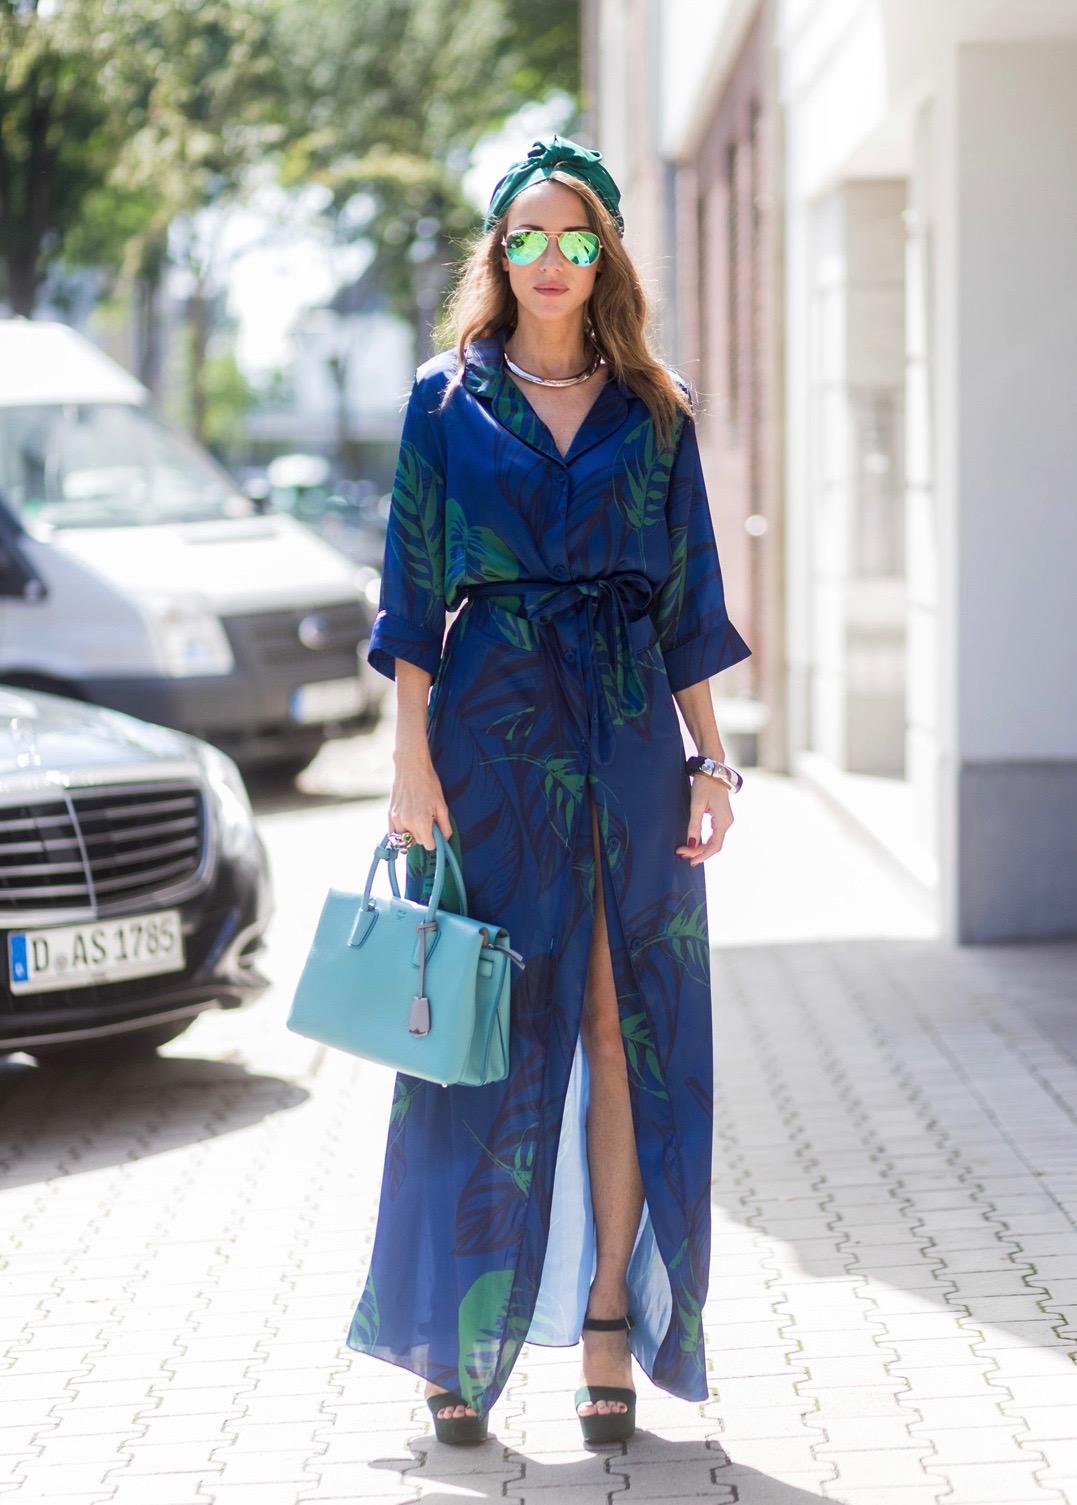 2c7ff65d Model and fashion blogger Alexandra Lapp wearing a blue Kimono maxi dress  with green leaf print